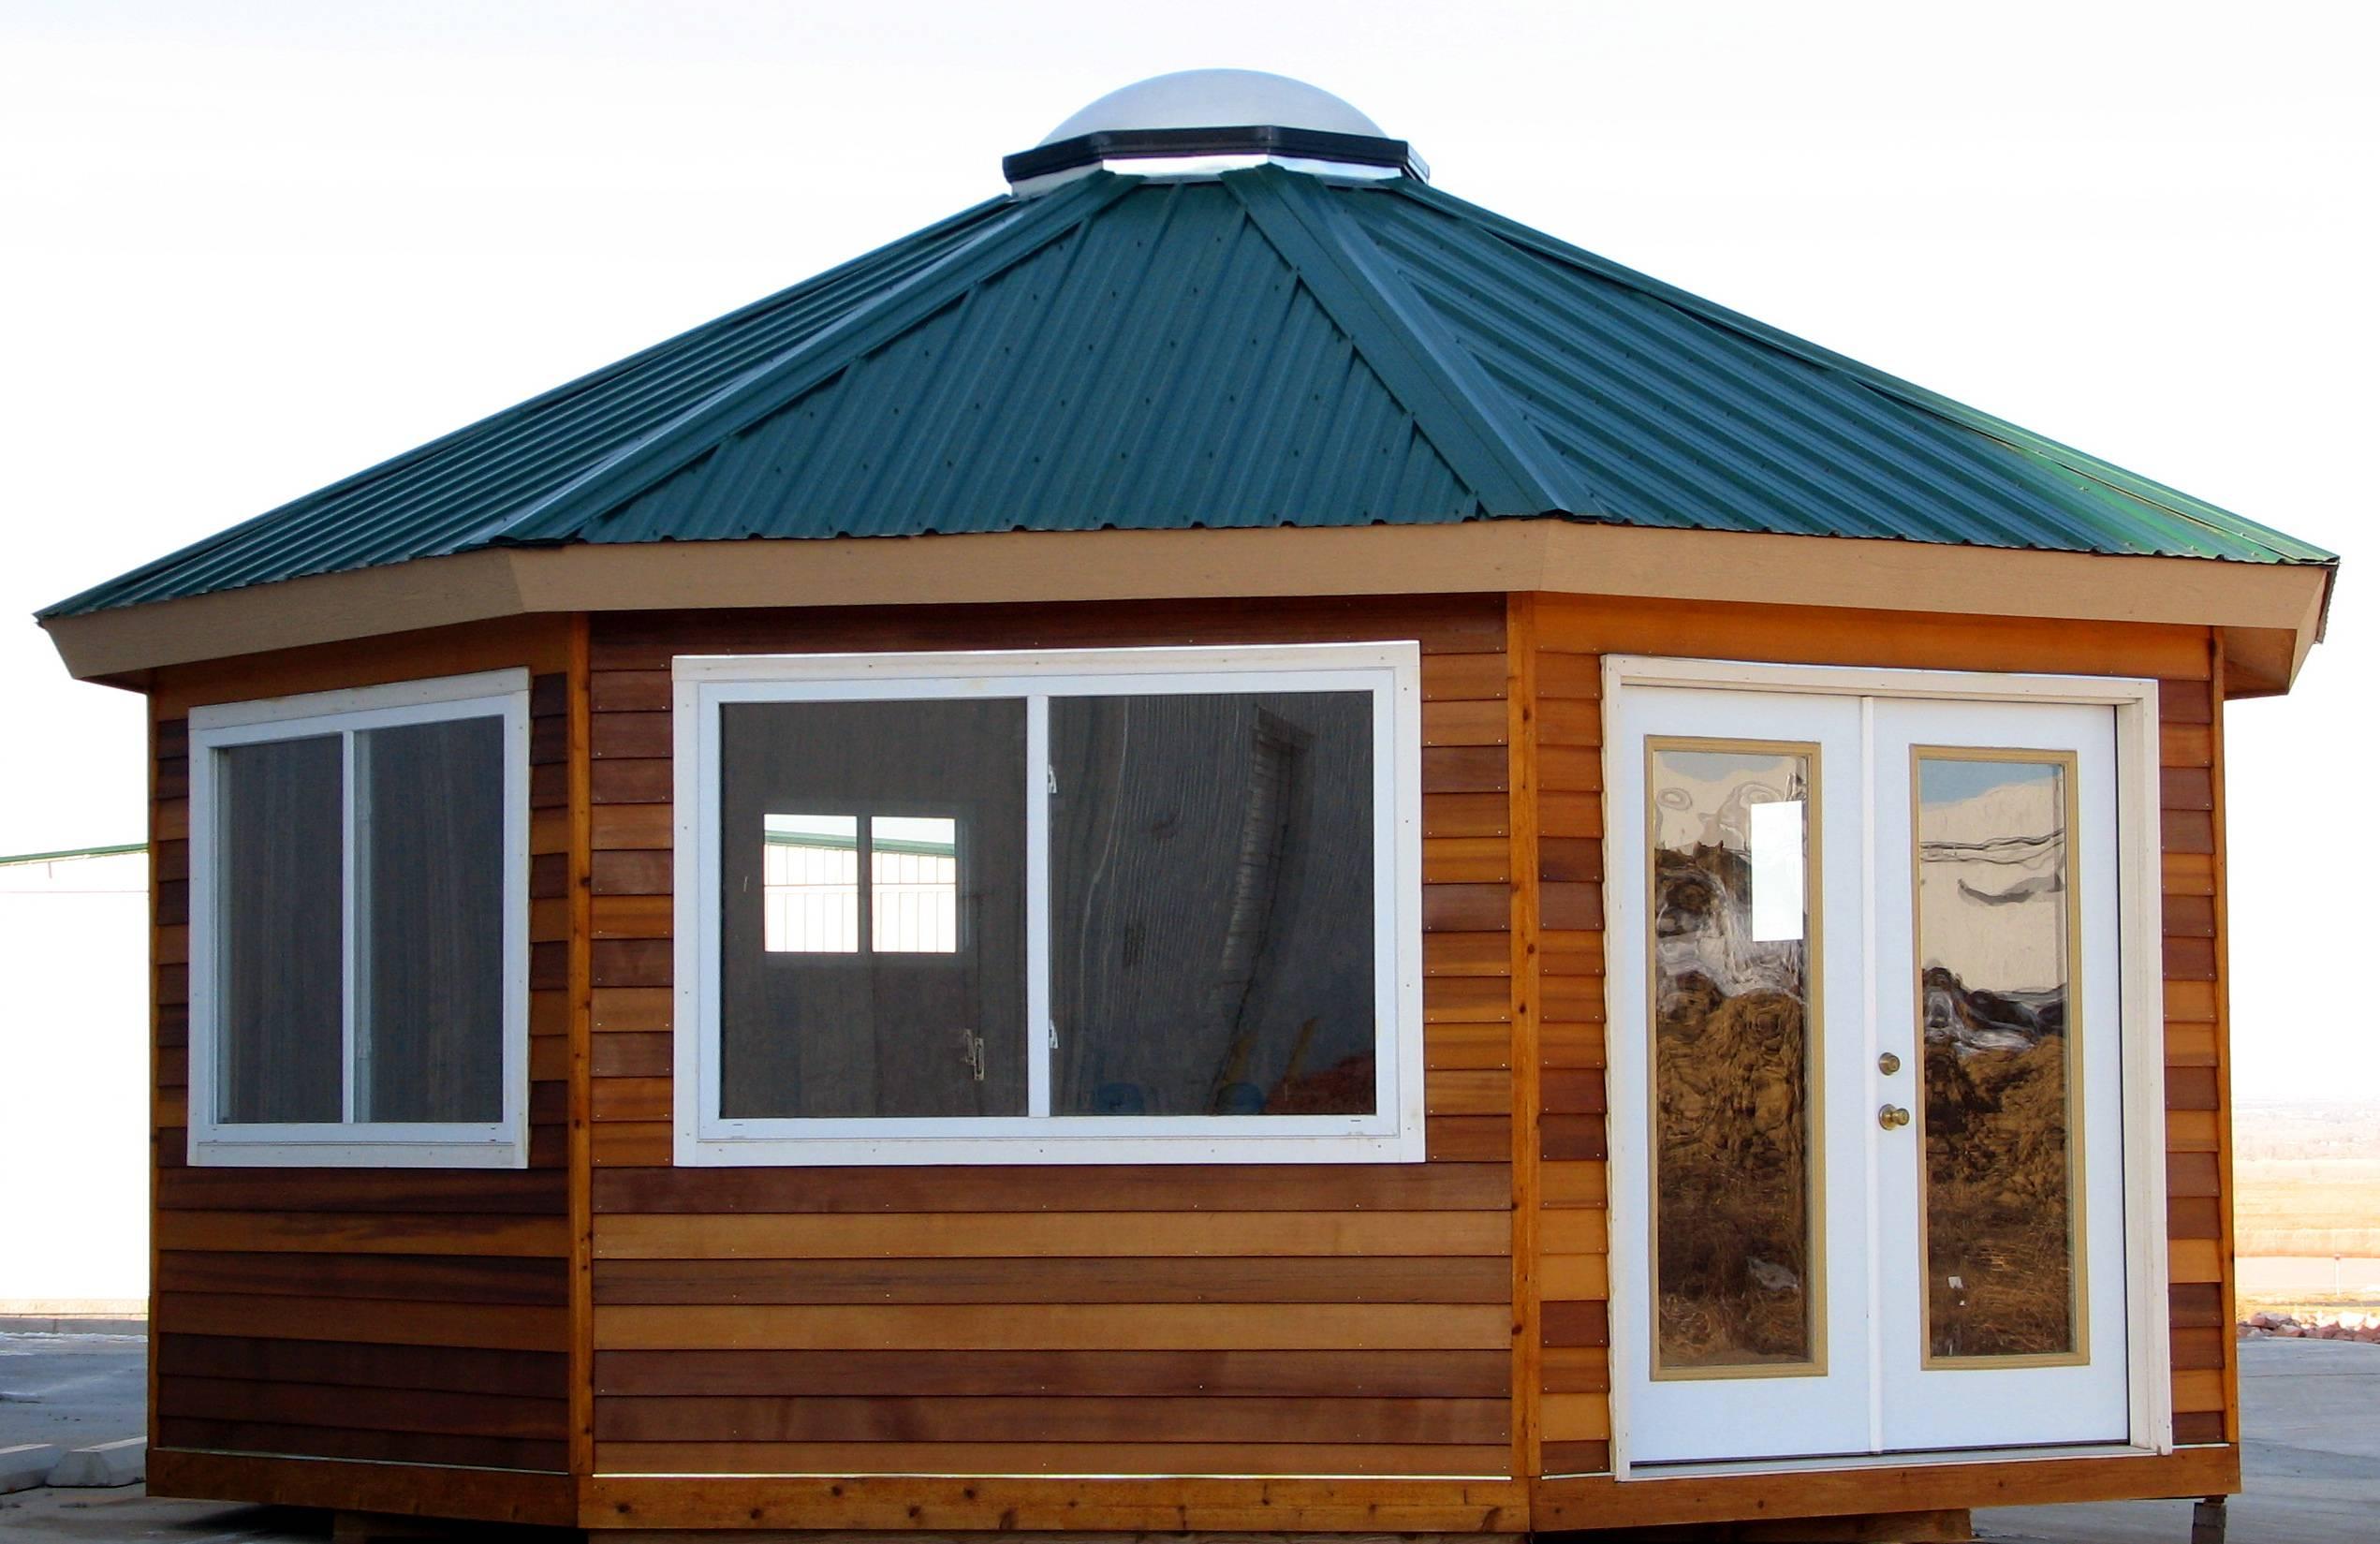 Tremendous Small Wooden House Plans Largest Home Design Picture Inspirations Pitcheantrous